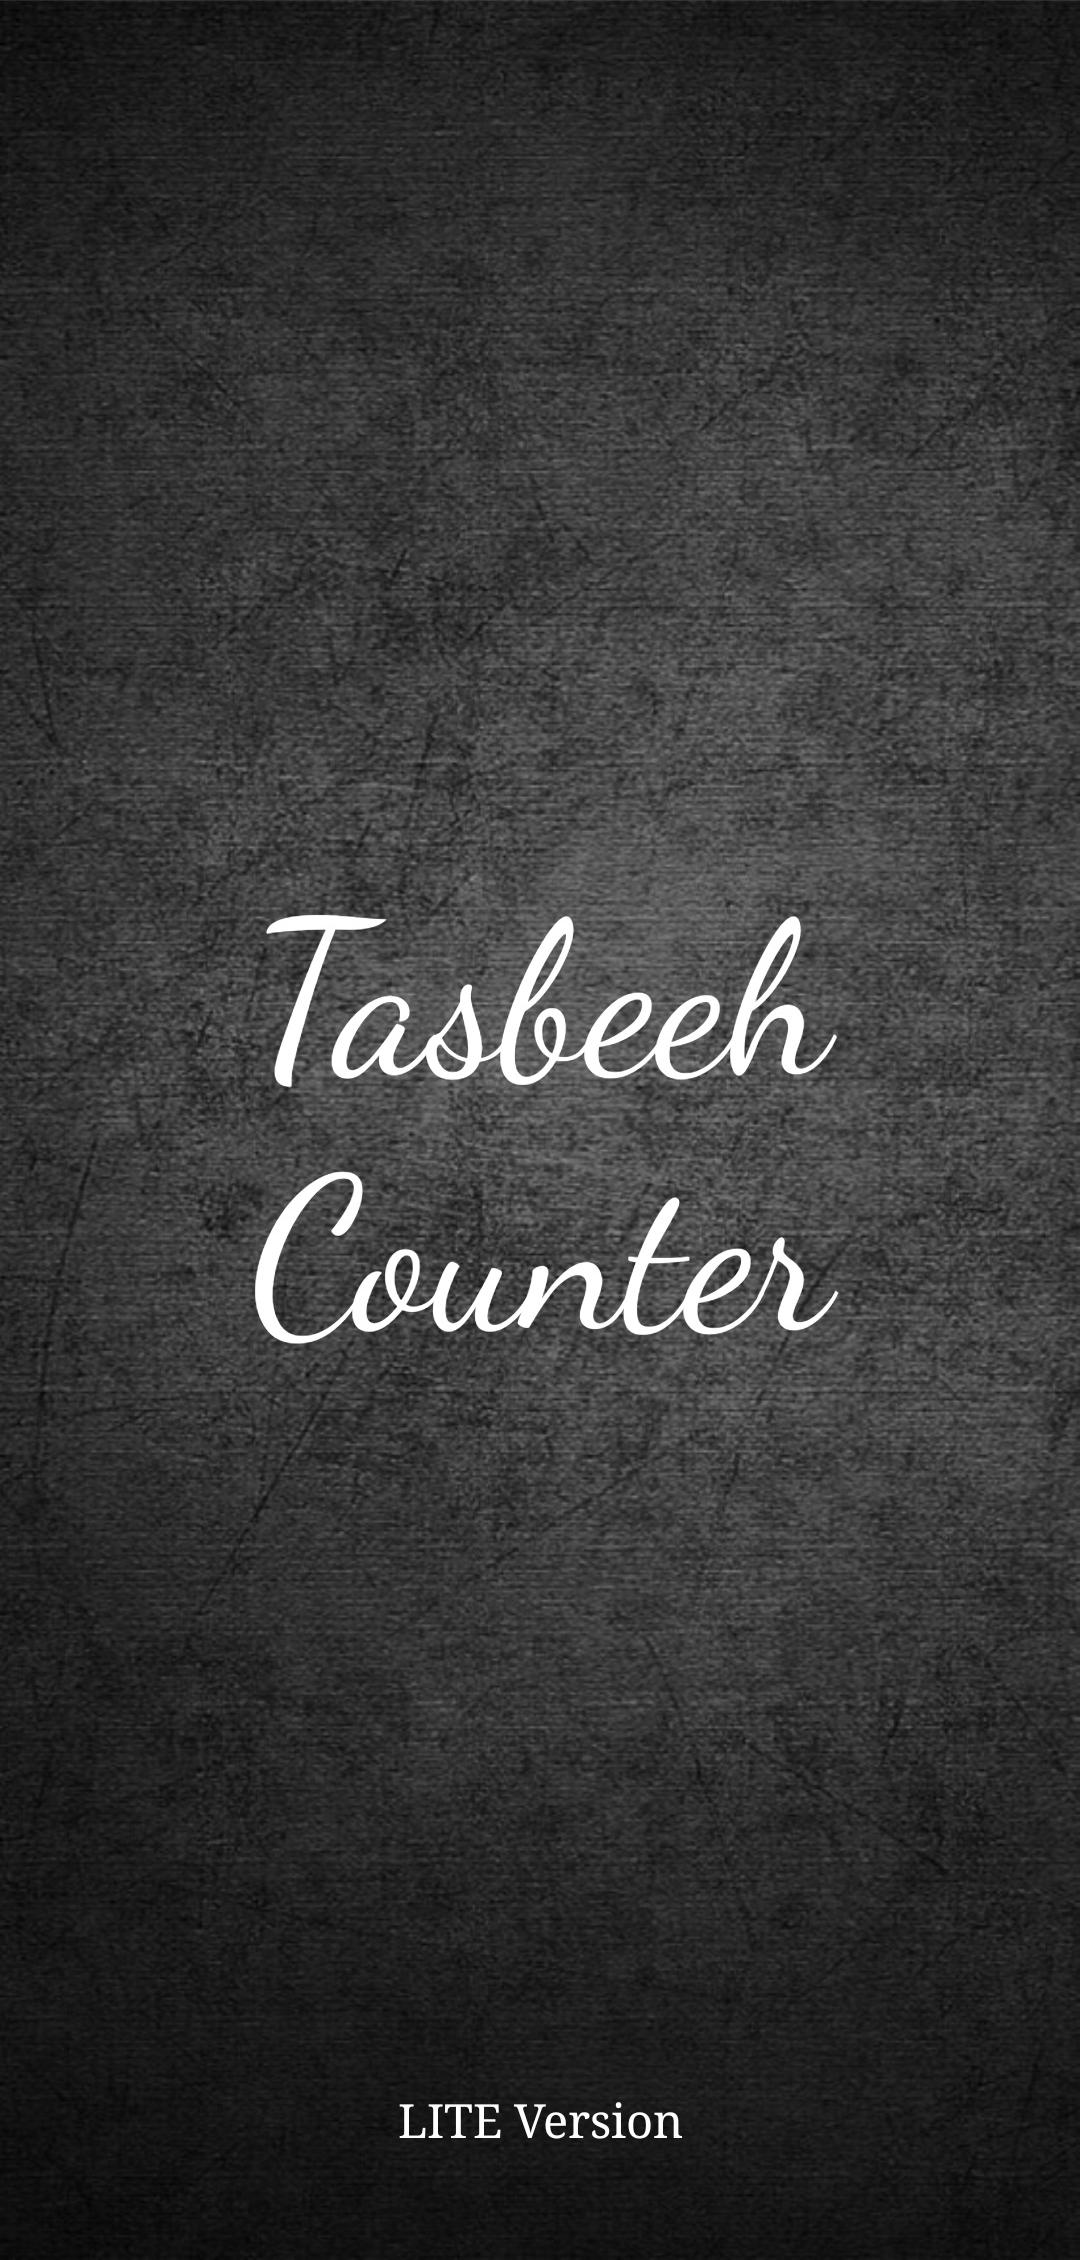 Tasbeeh Counter: Digital Tasbeeh